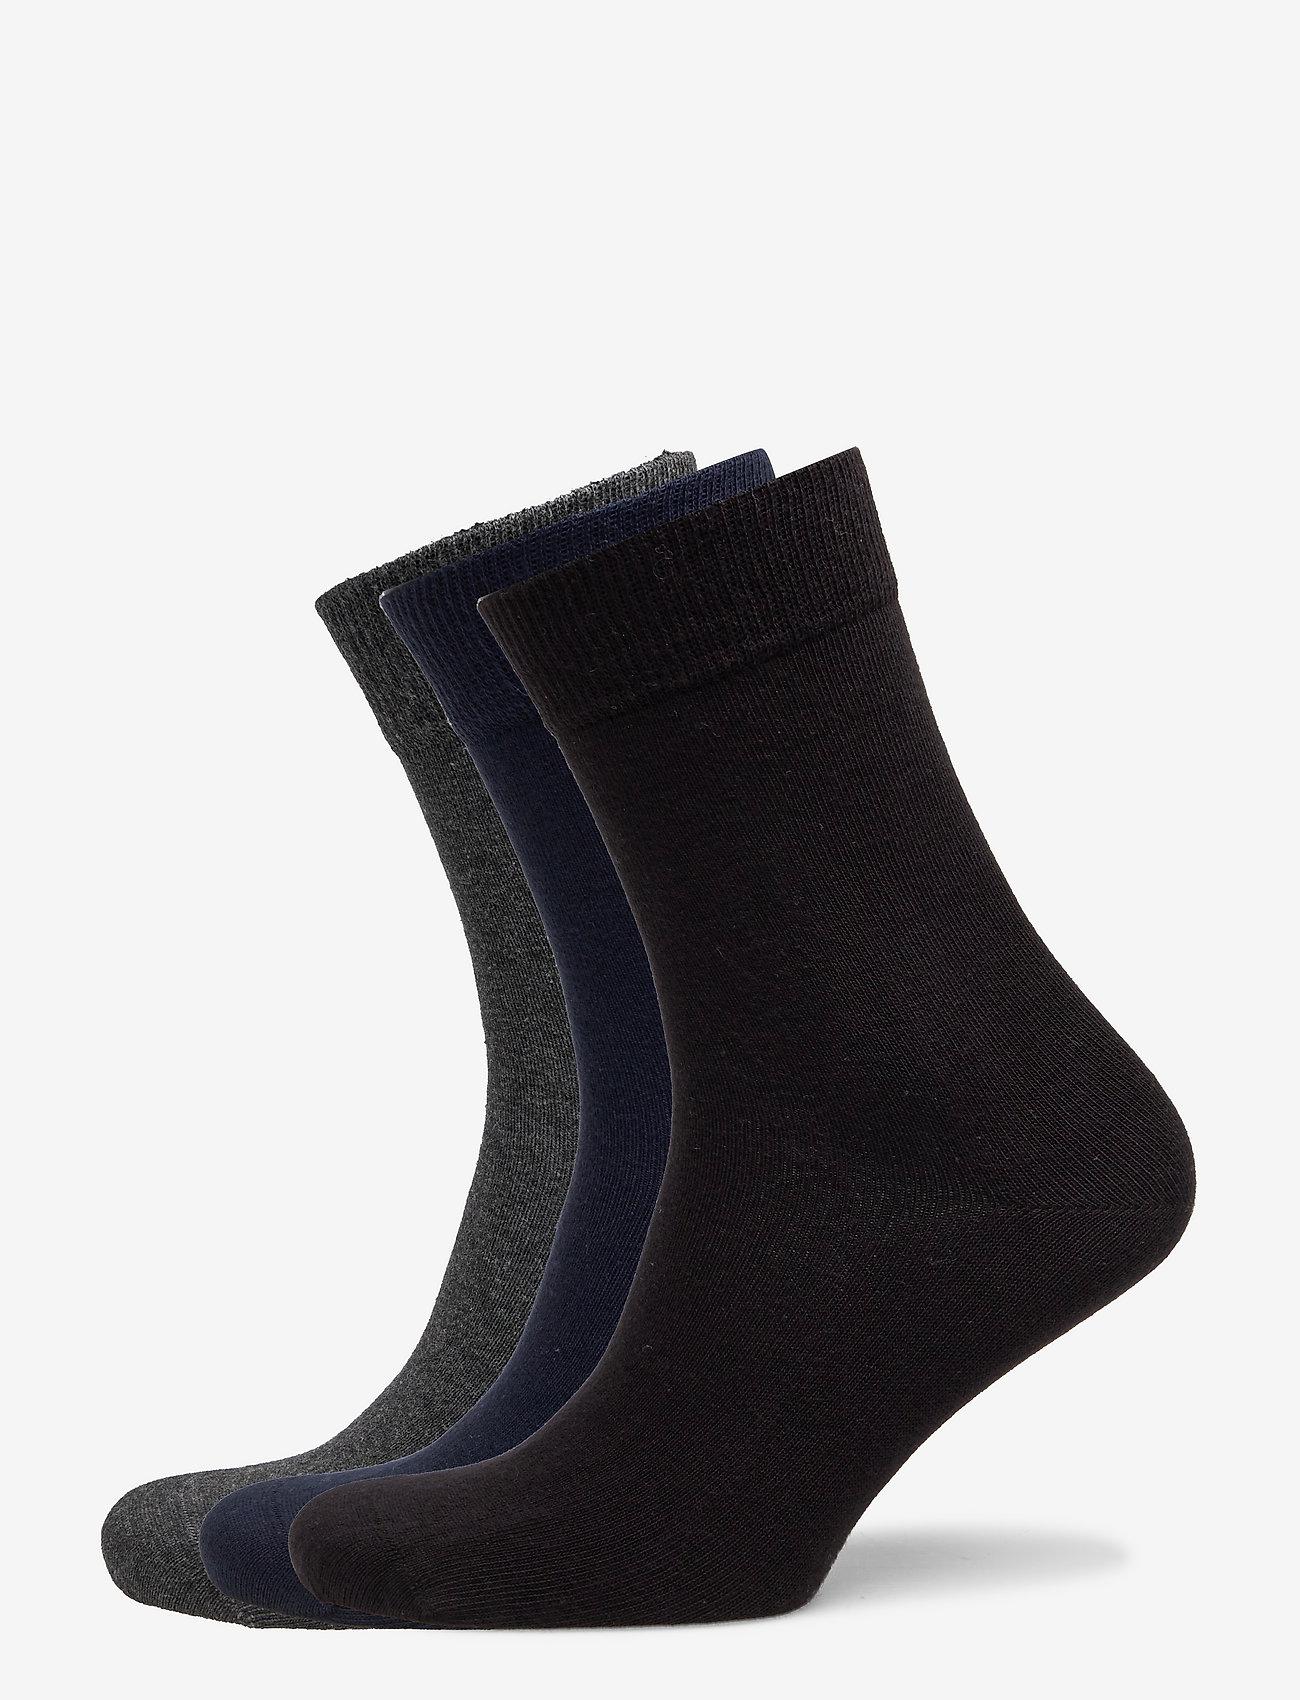 Björn Borg - SOCK ANKLE SOLIDS - regular socks - anthracite melange - 0